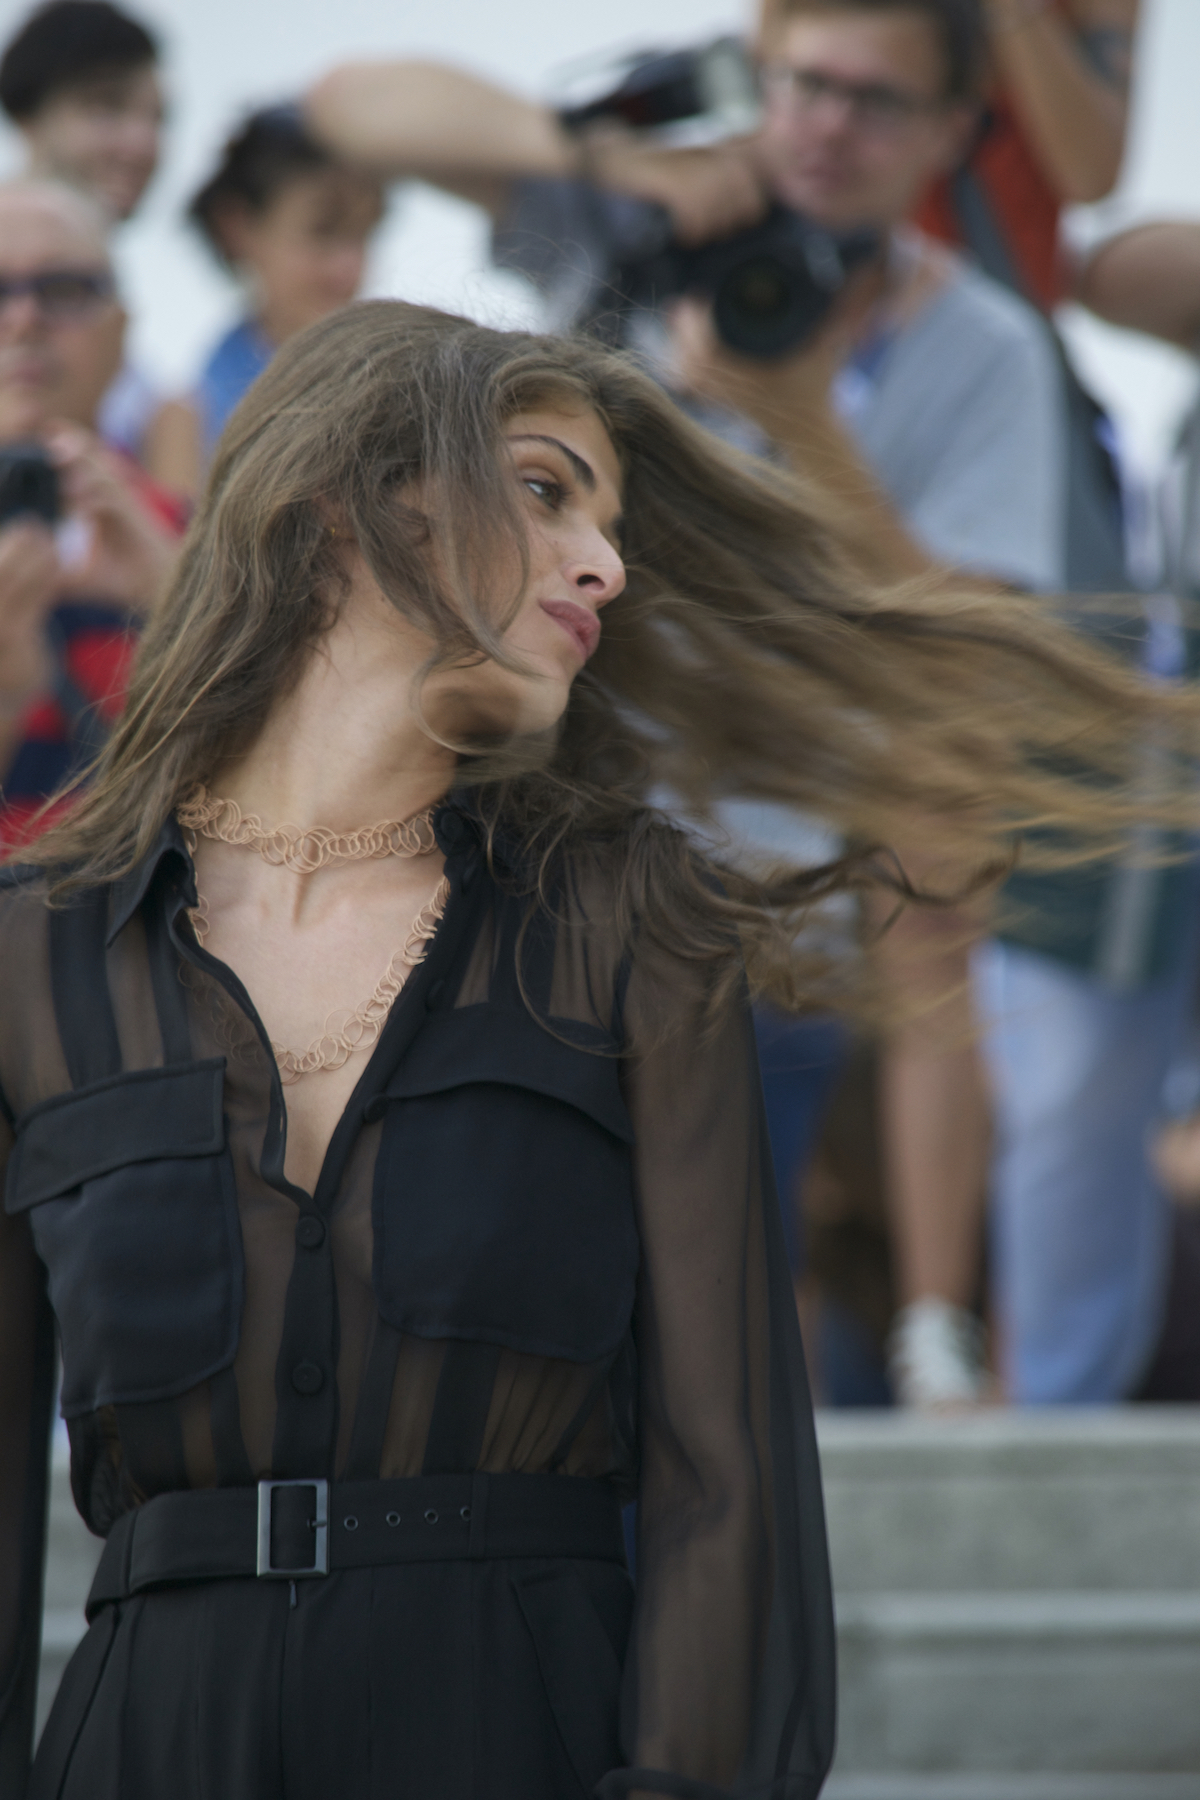 Venezia 2015: La madrina Elisa Sednaoui con i capelli al vento